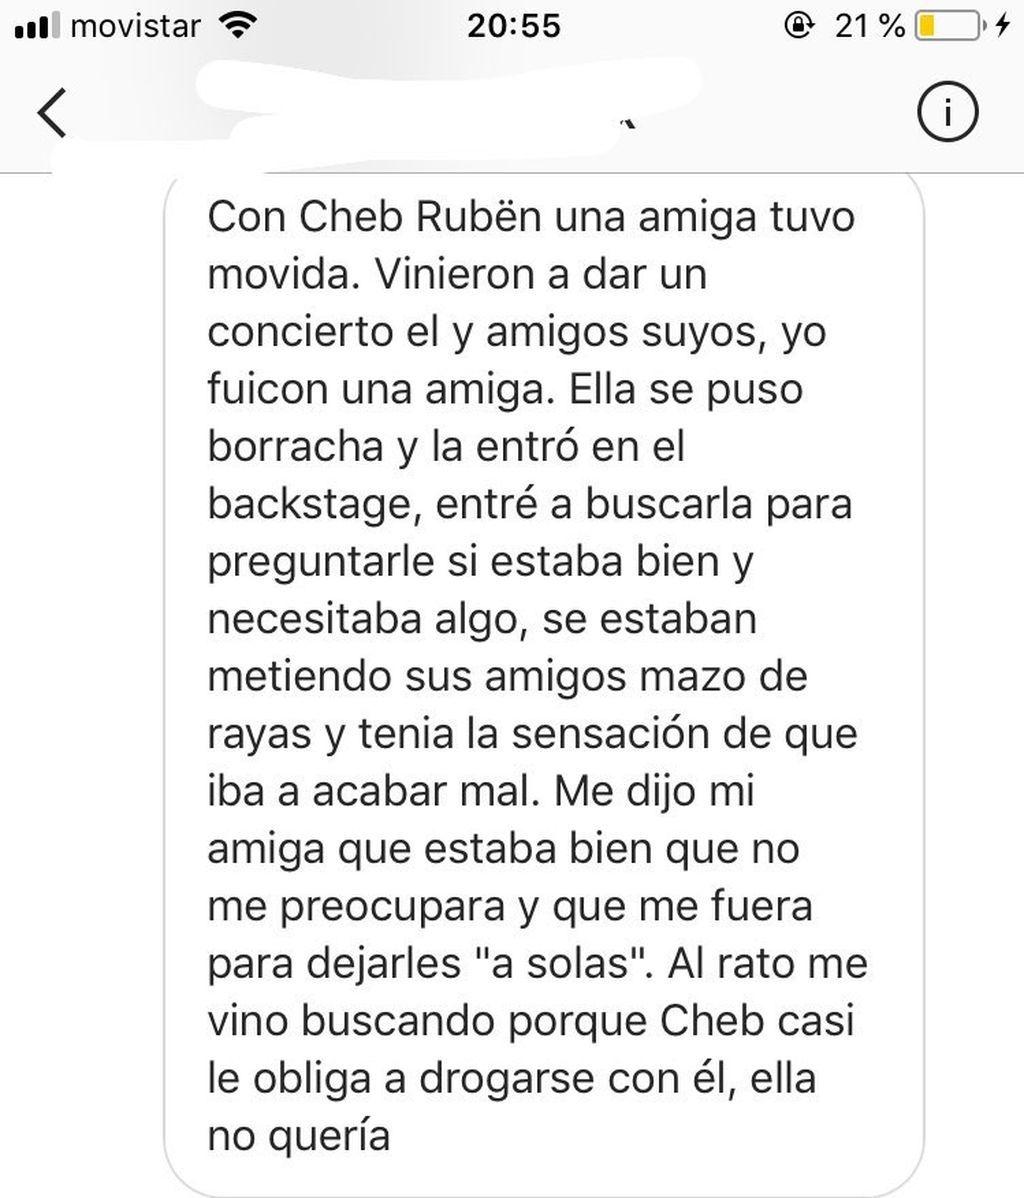 Cheb Ruben